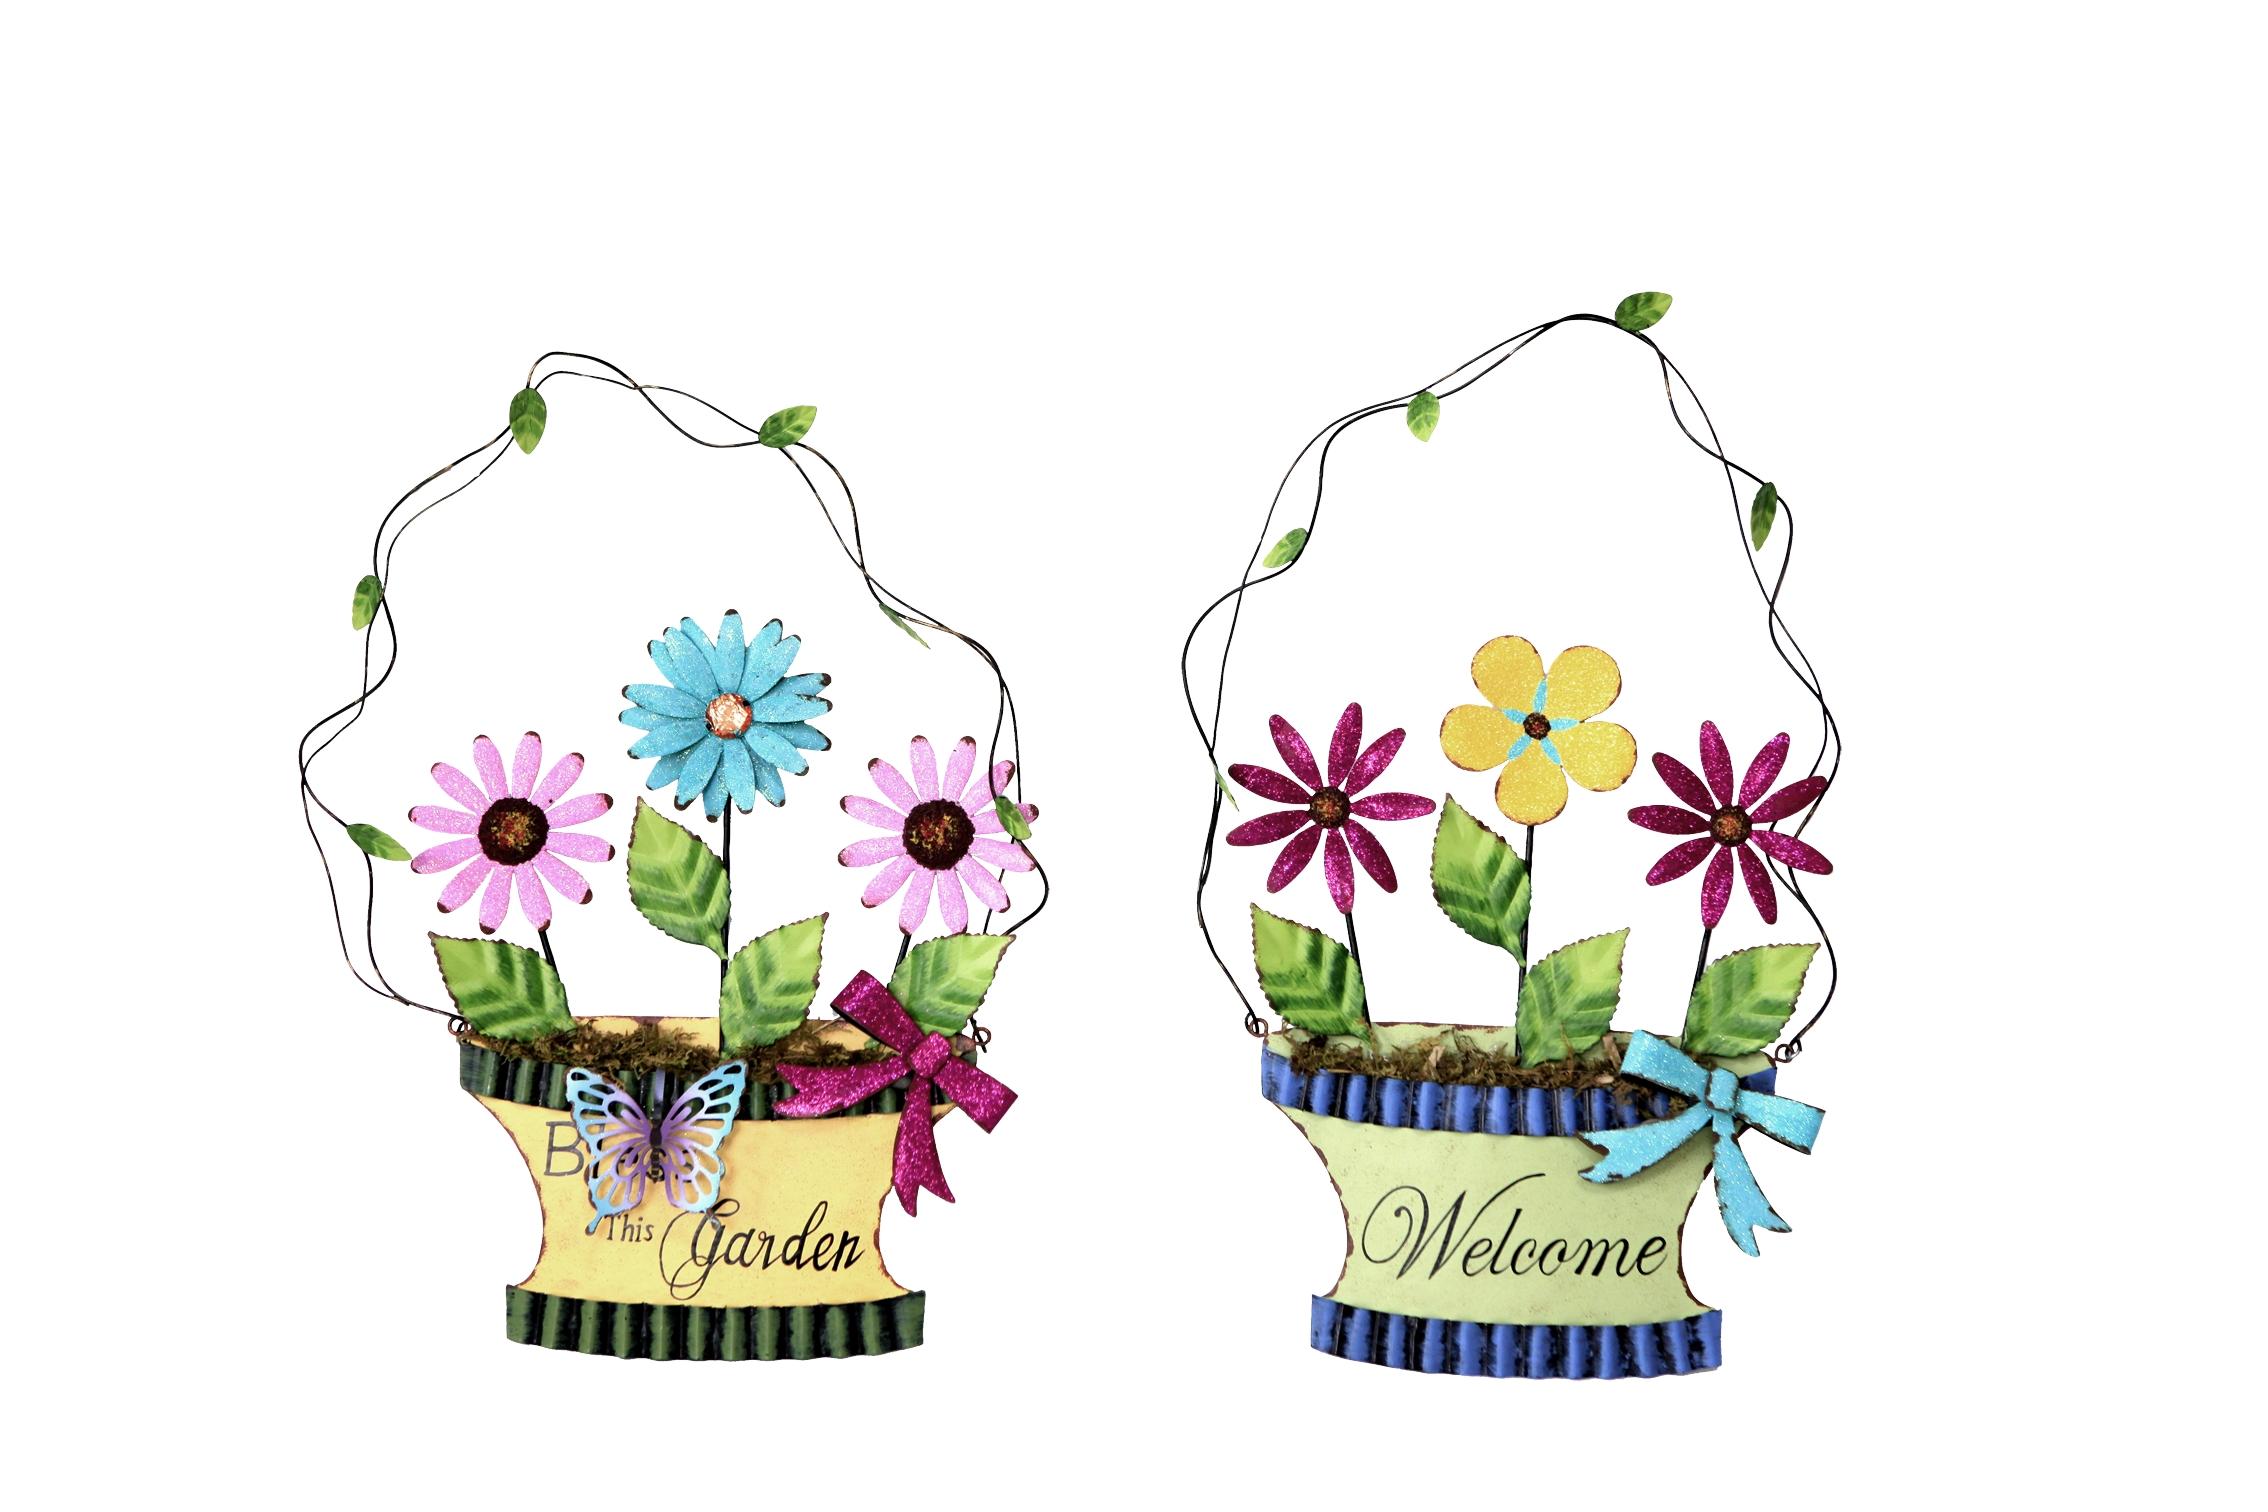 Annie design wall flower baskets online store powered by storenvy - Wall flower design ...